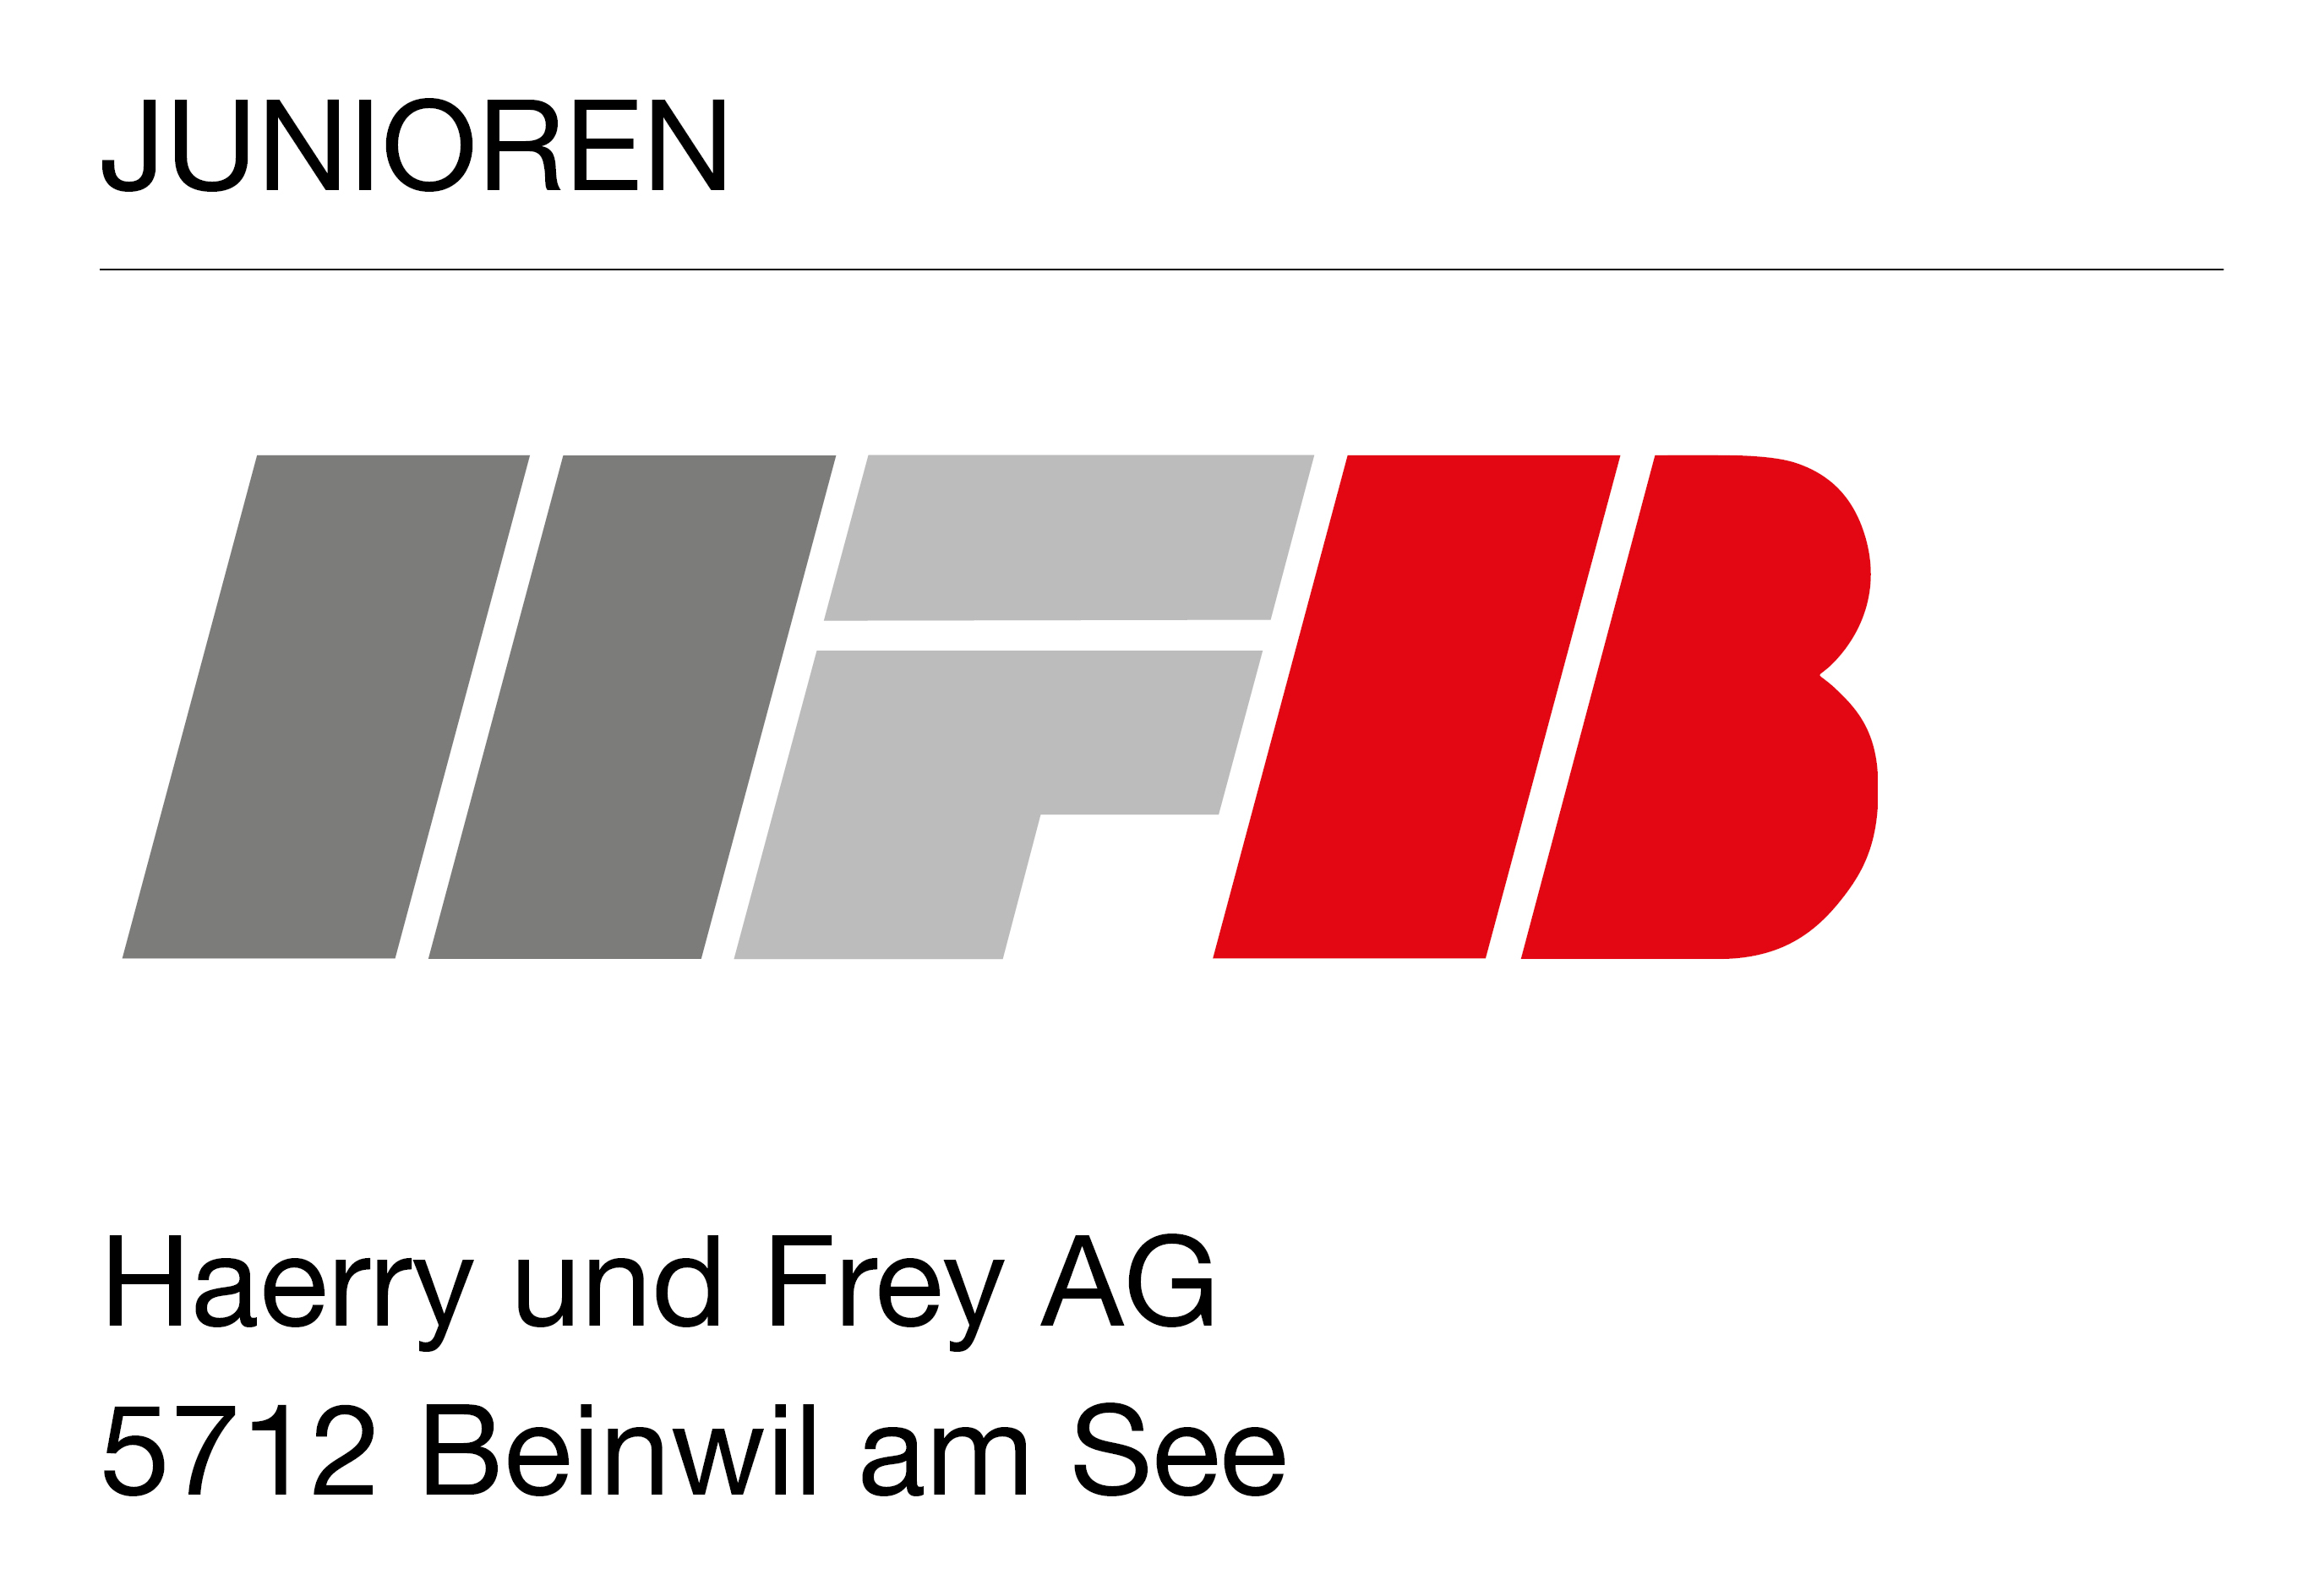 Haerry und Frey AG